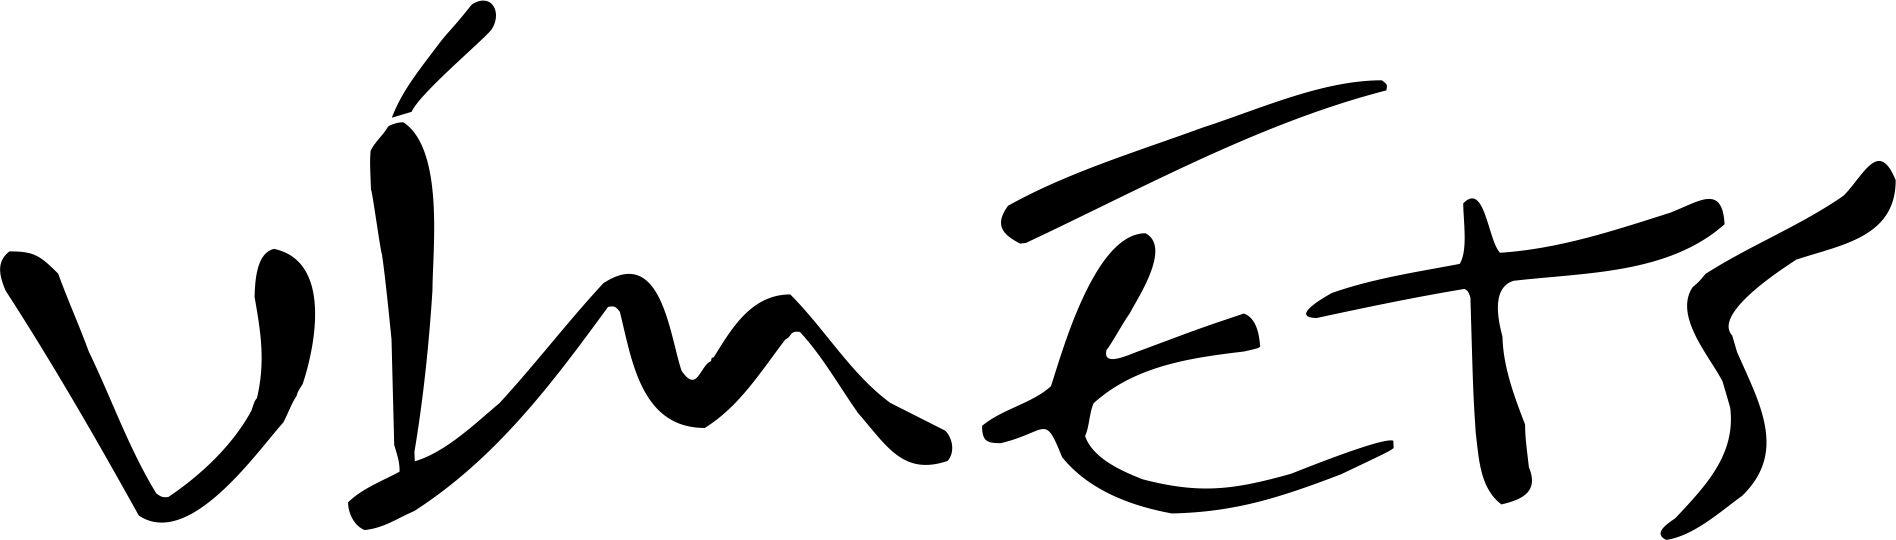 Logo comerç VIMETS